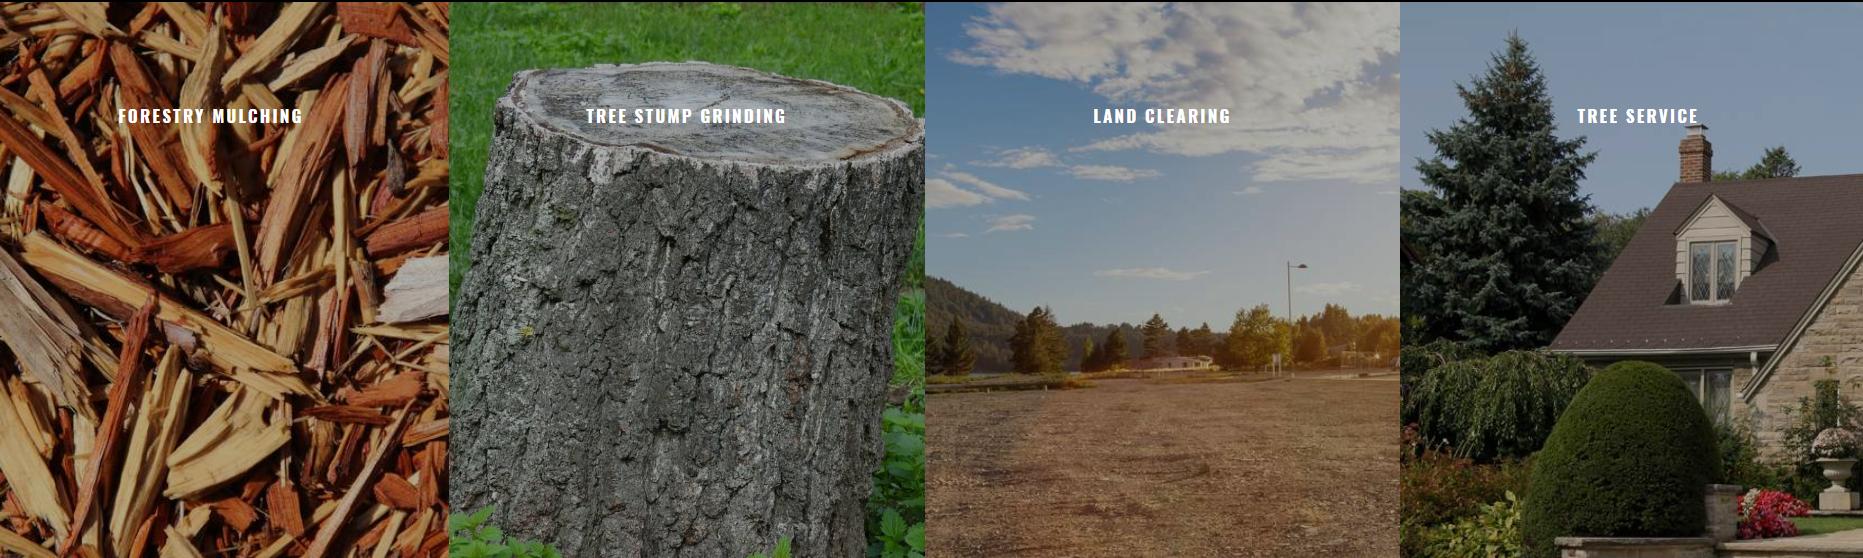 Trents Land Services